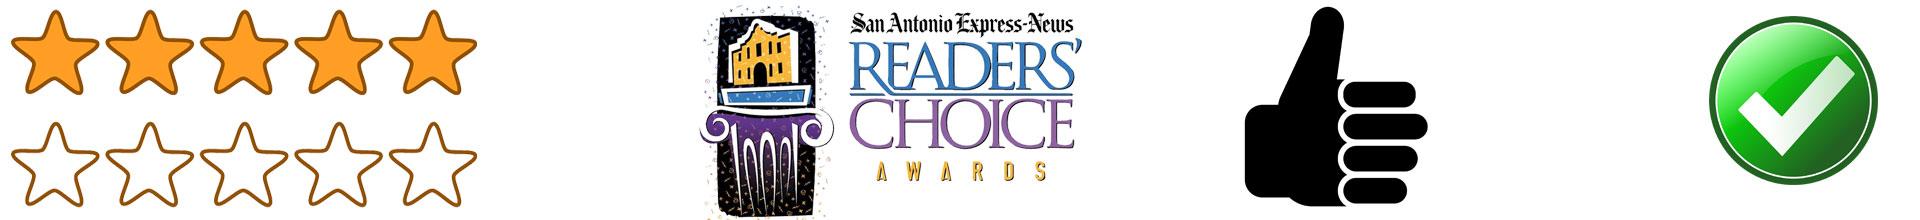 Readers Choice Awards Header